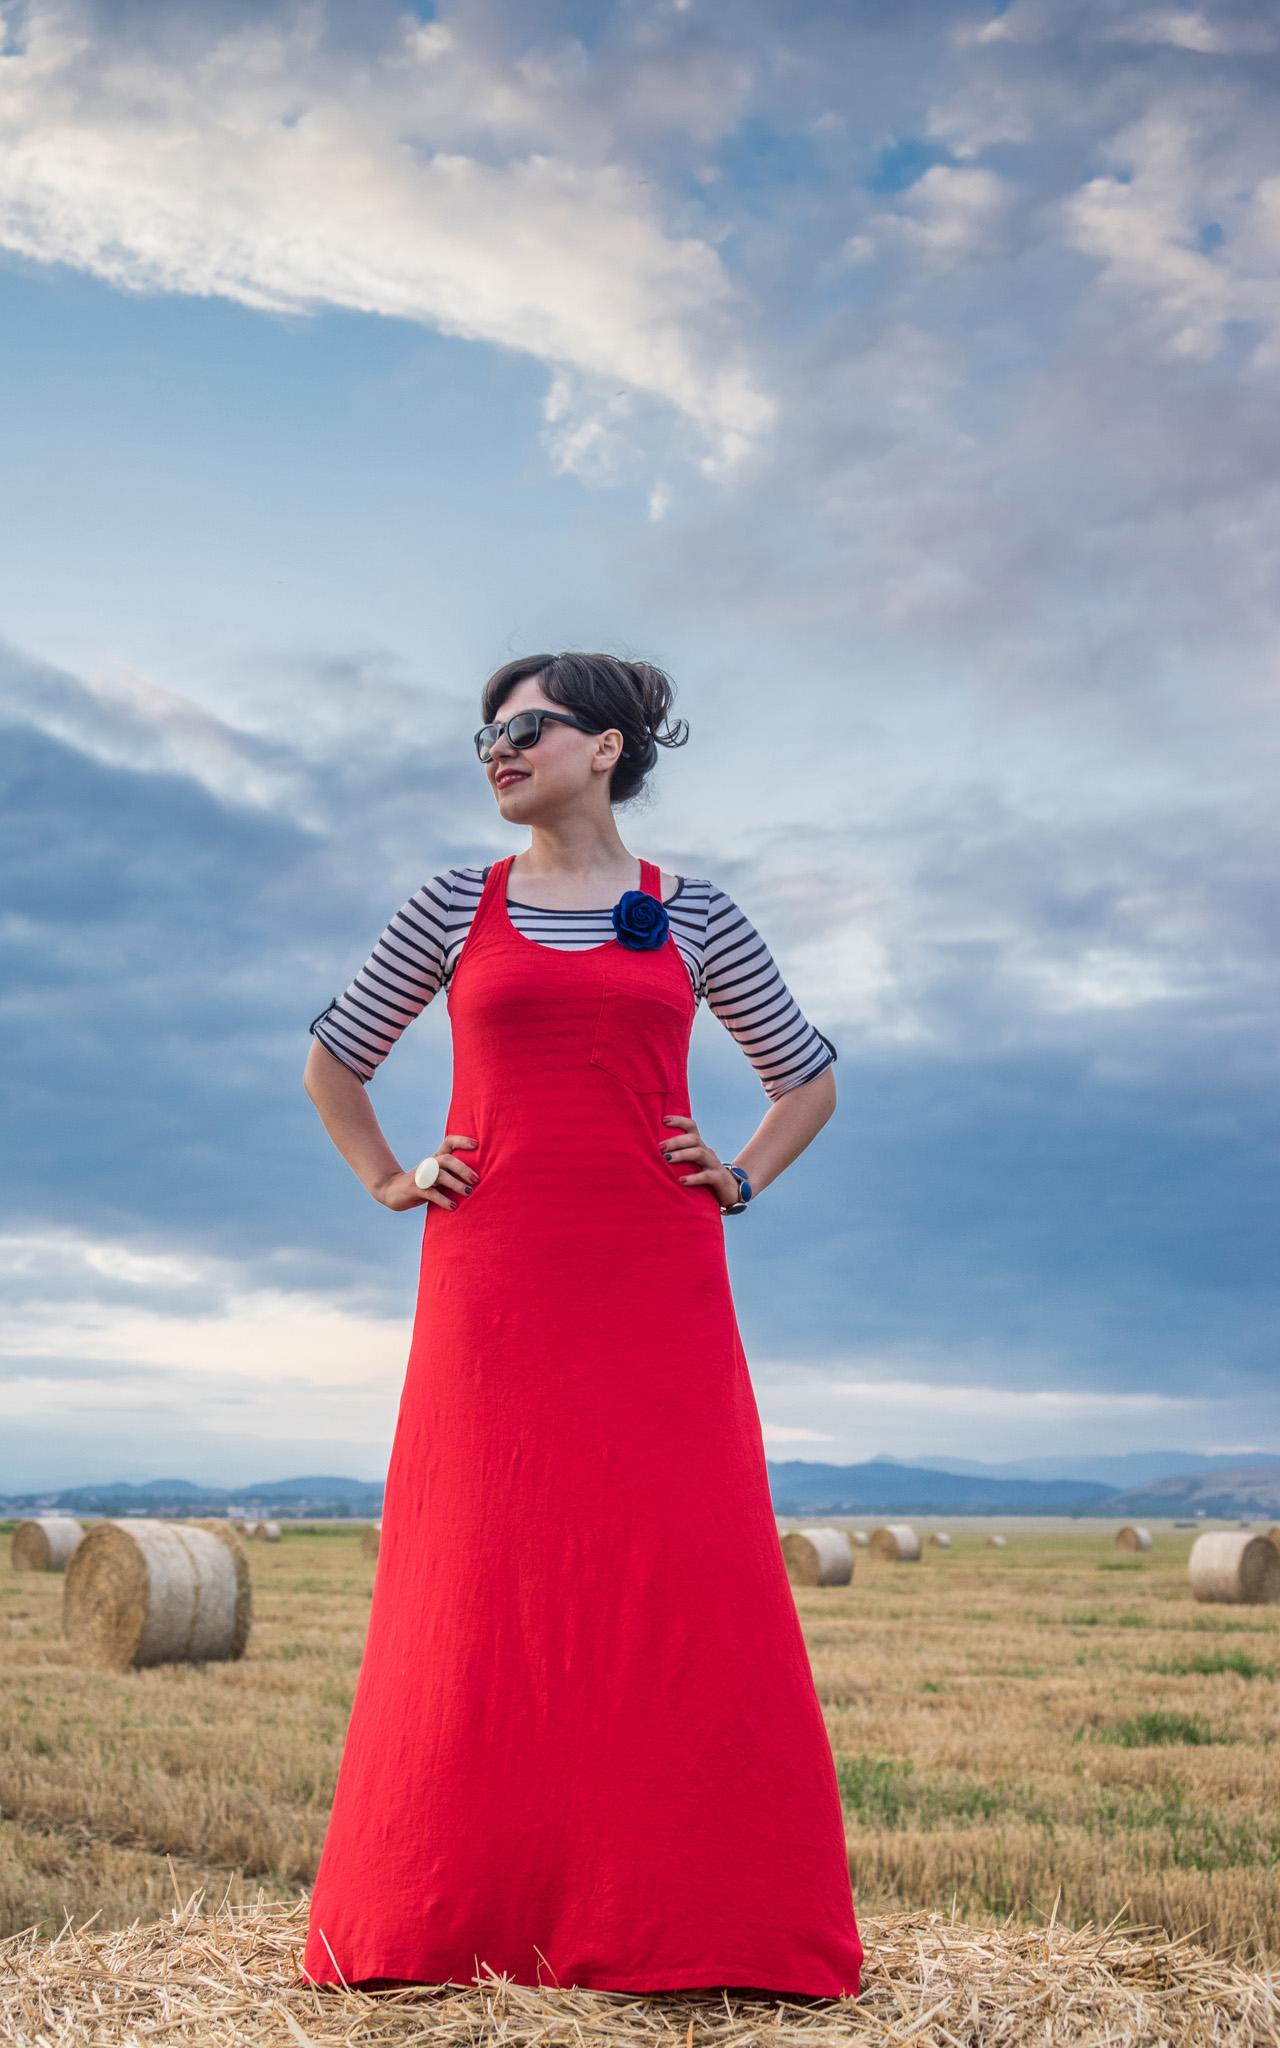 maxi red dress striped top stripes pimkie black flats cardigan hay bales photo shooting  black maxi bag brasov trip mountains